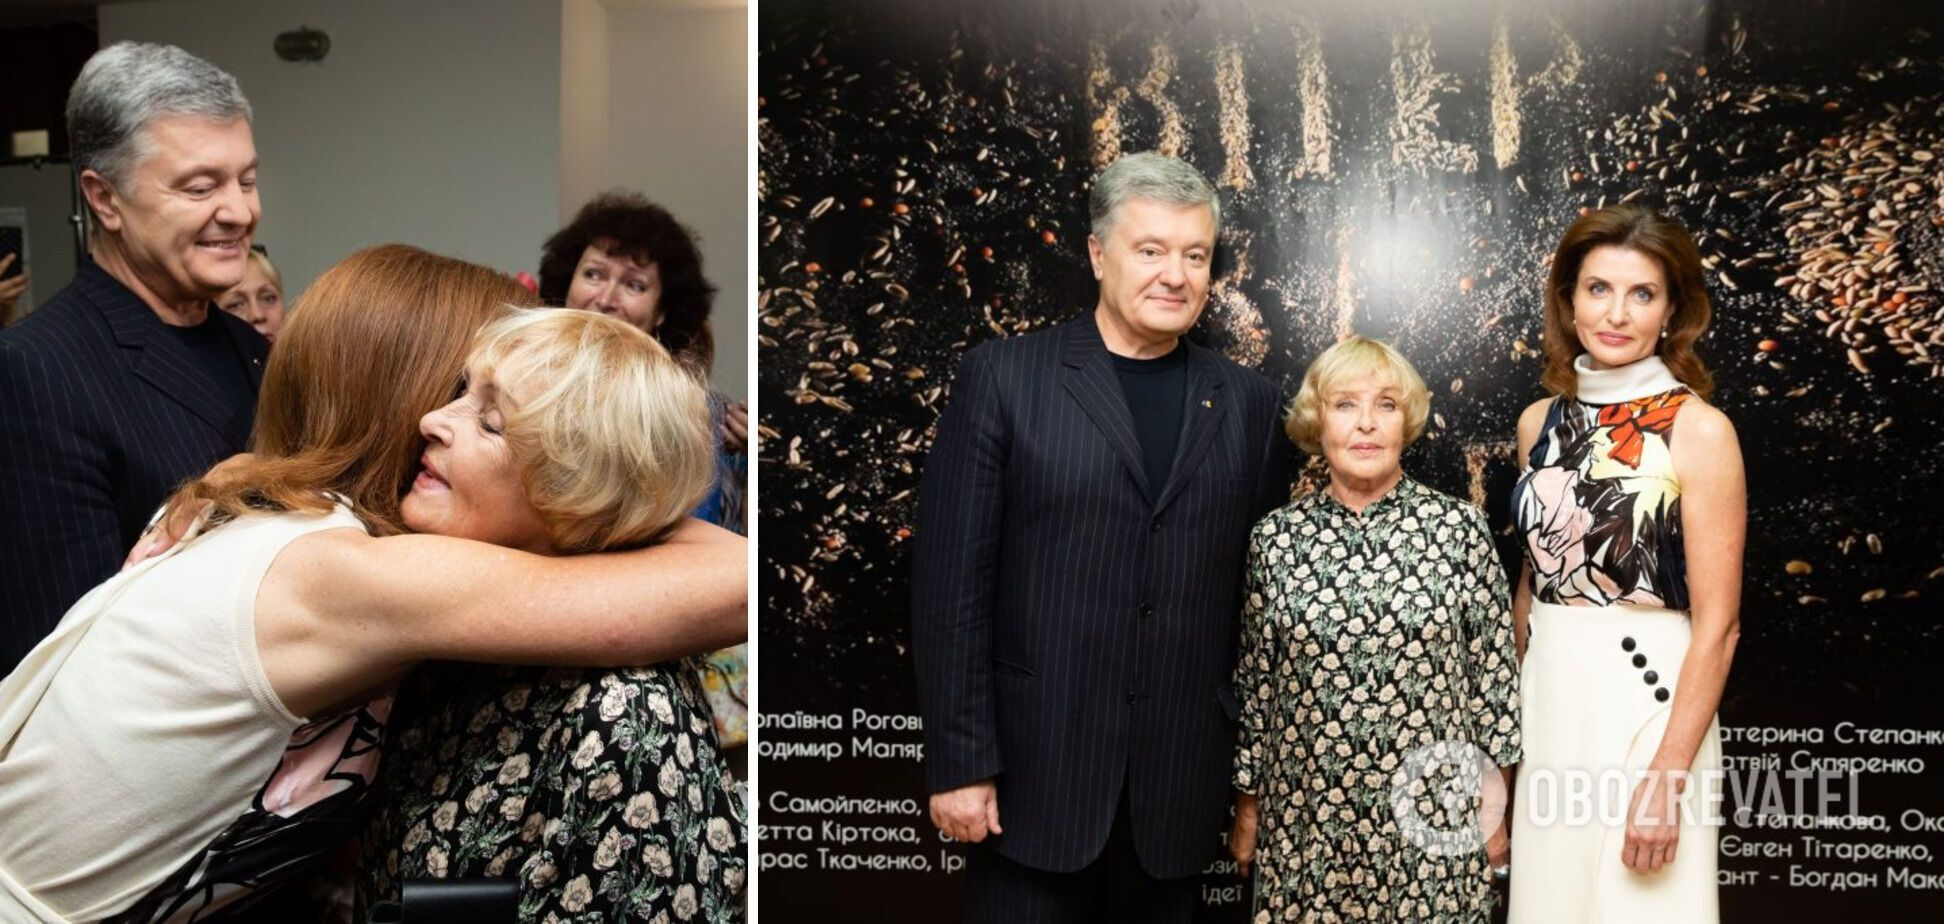 Супруги Порошенко поздравили Аду Роговцеву на премьере фильма. Фото